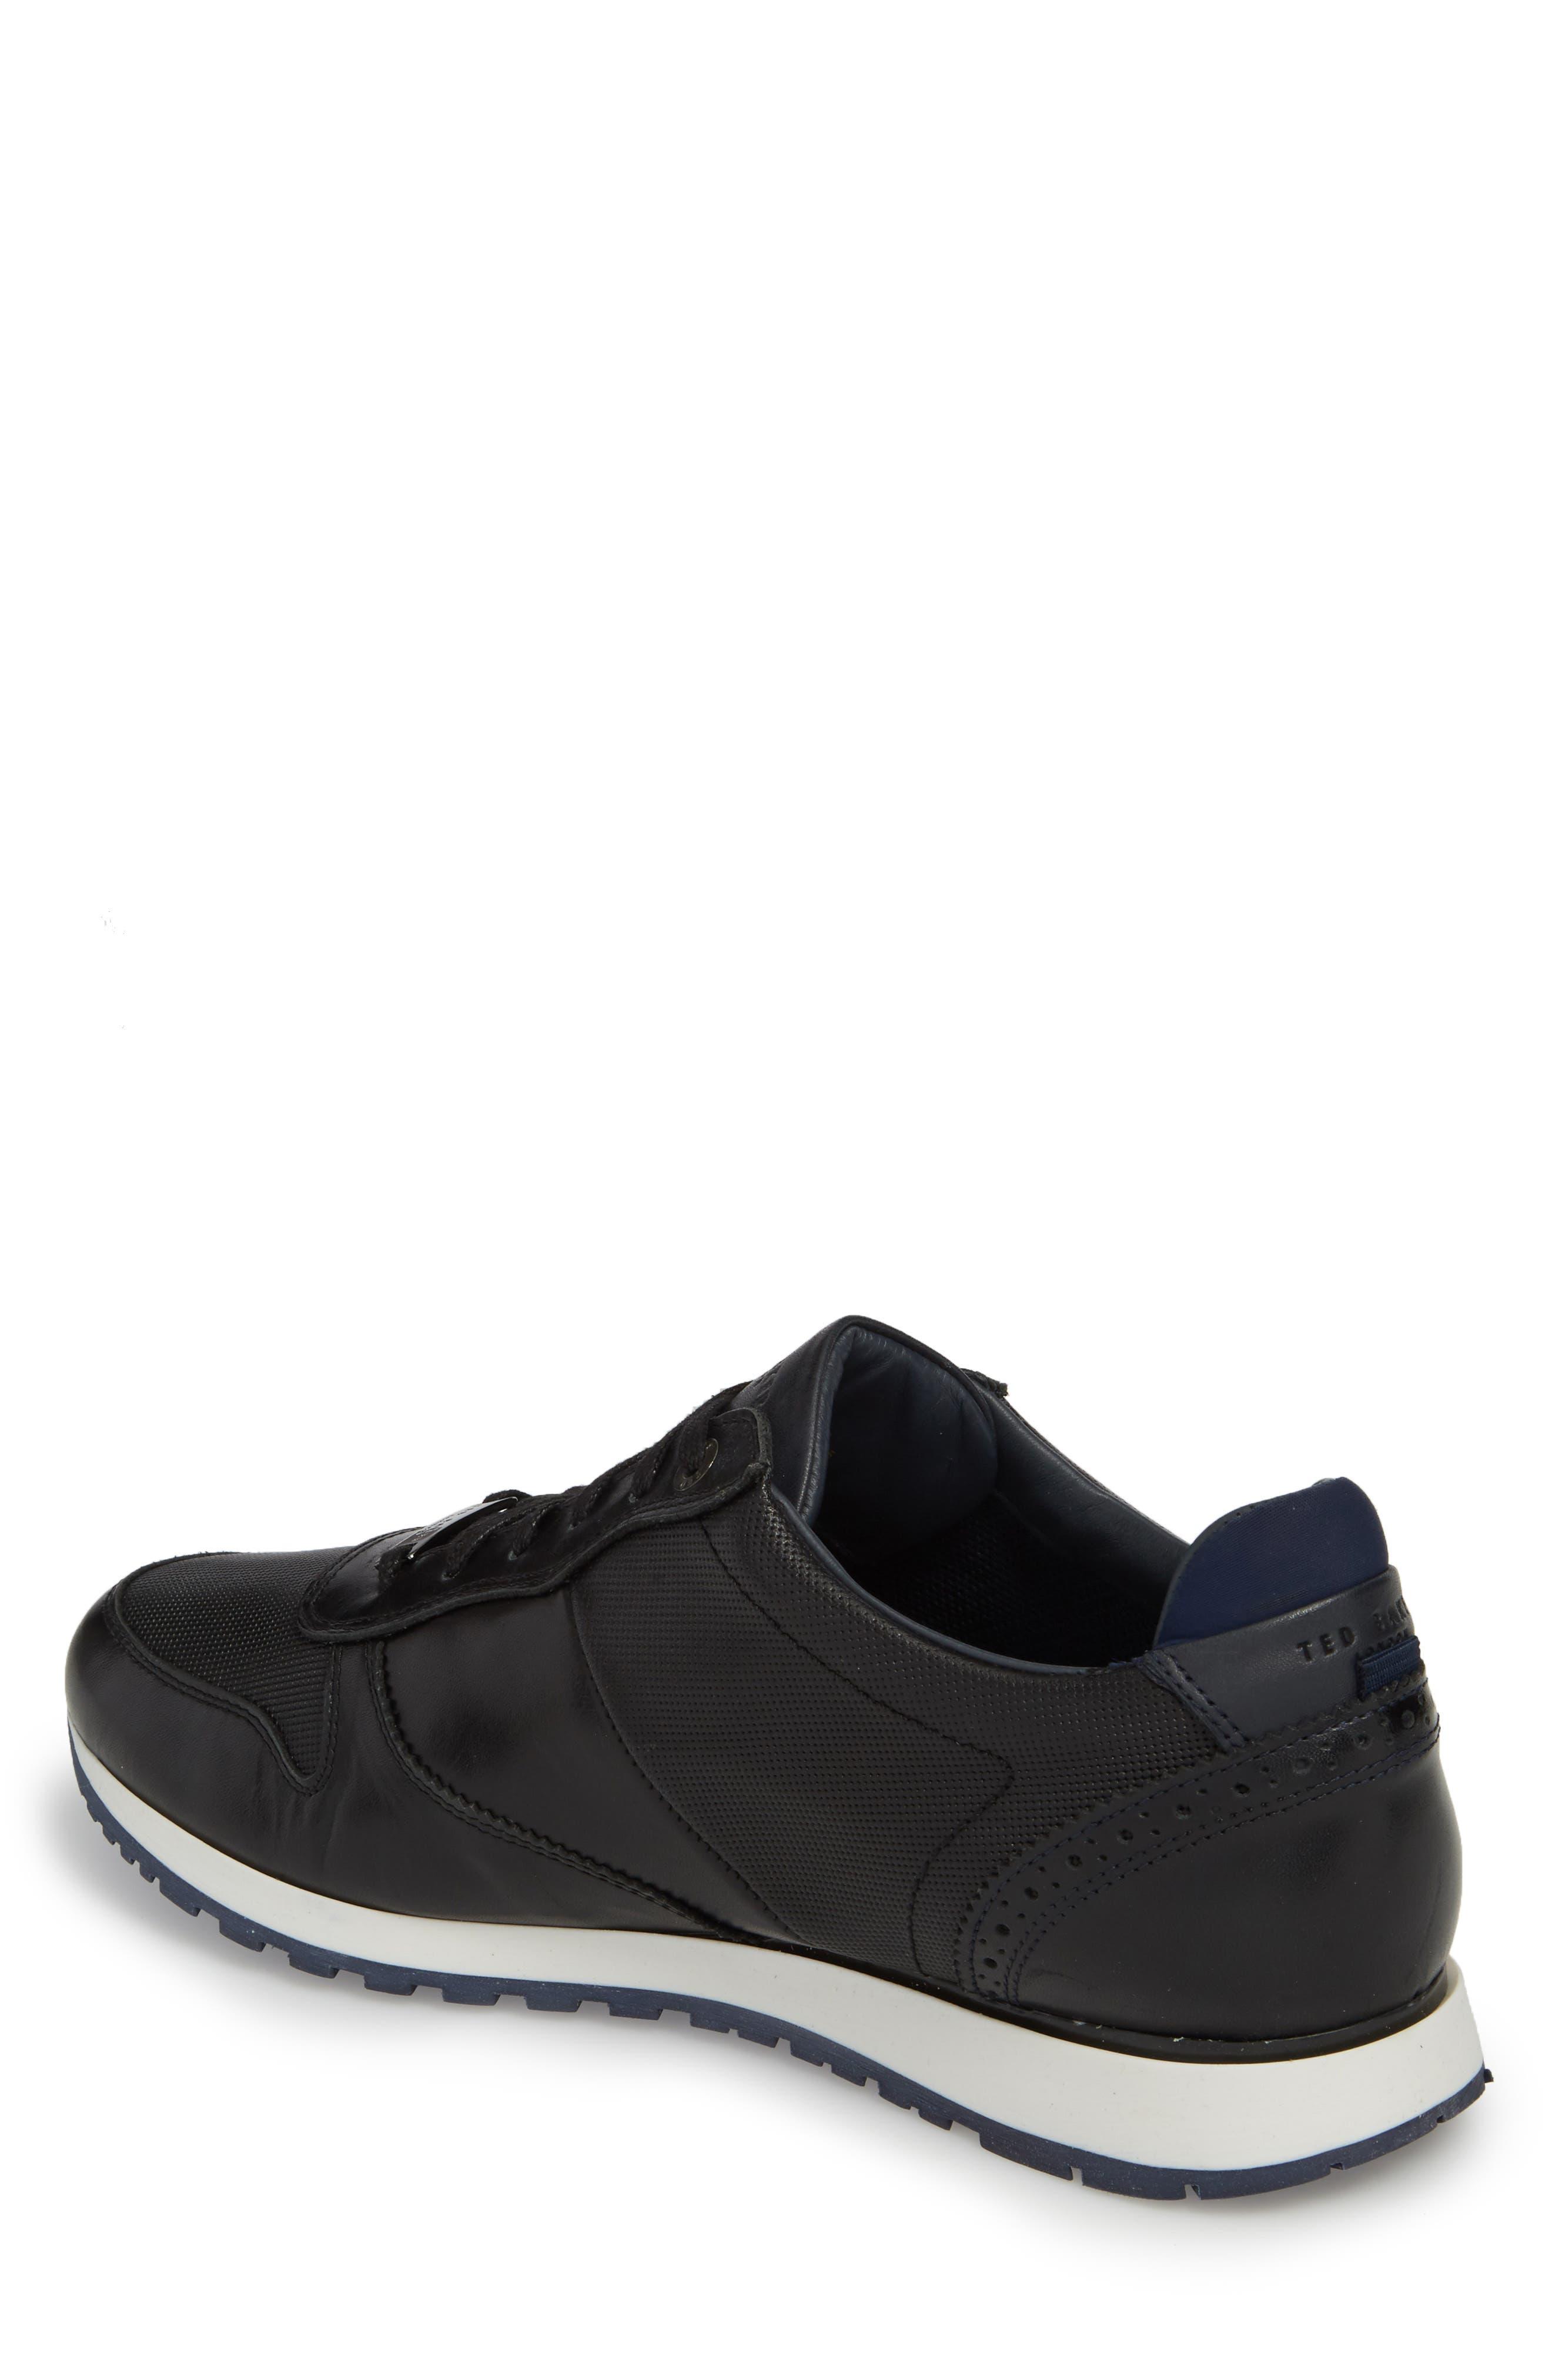 Shindl Sneaker,                             Alternate thumbnail 2, color,                             Black Leather